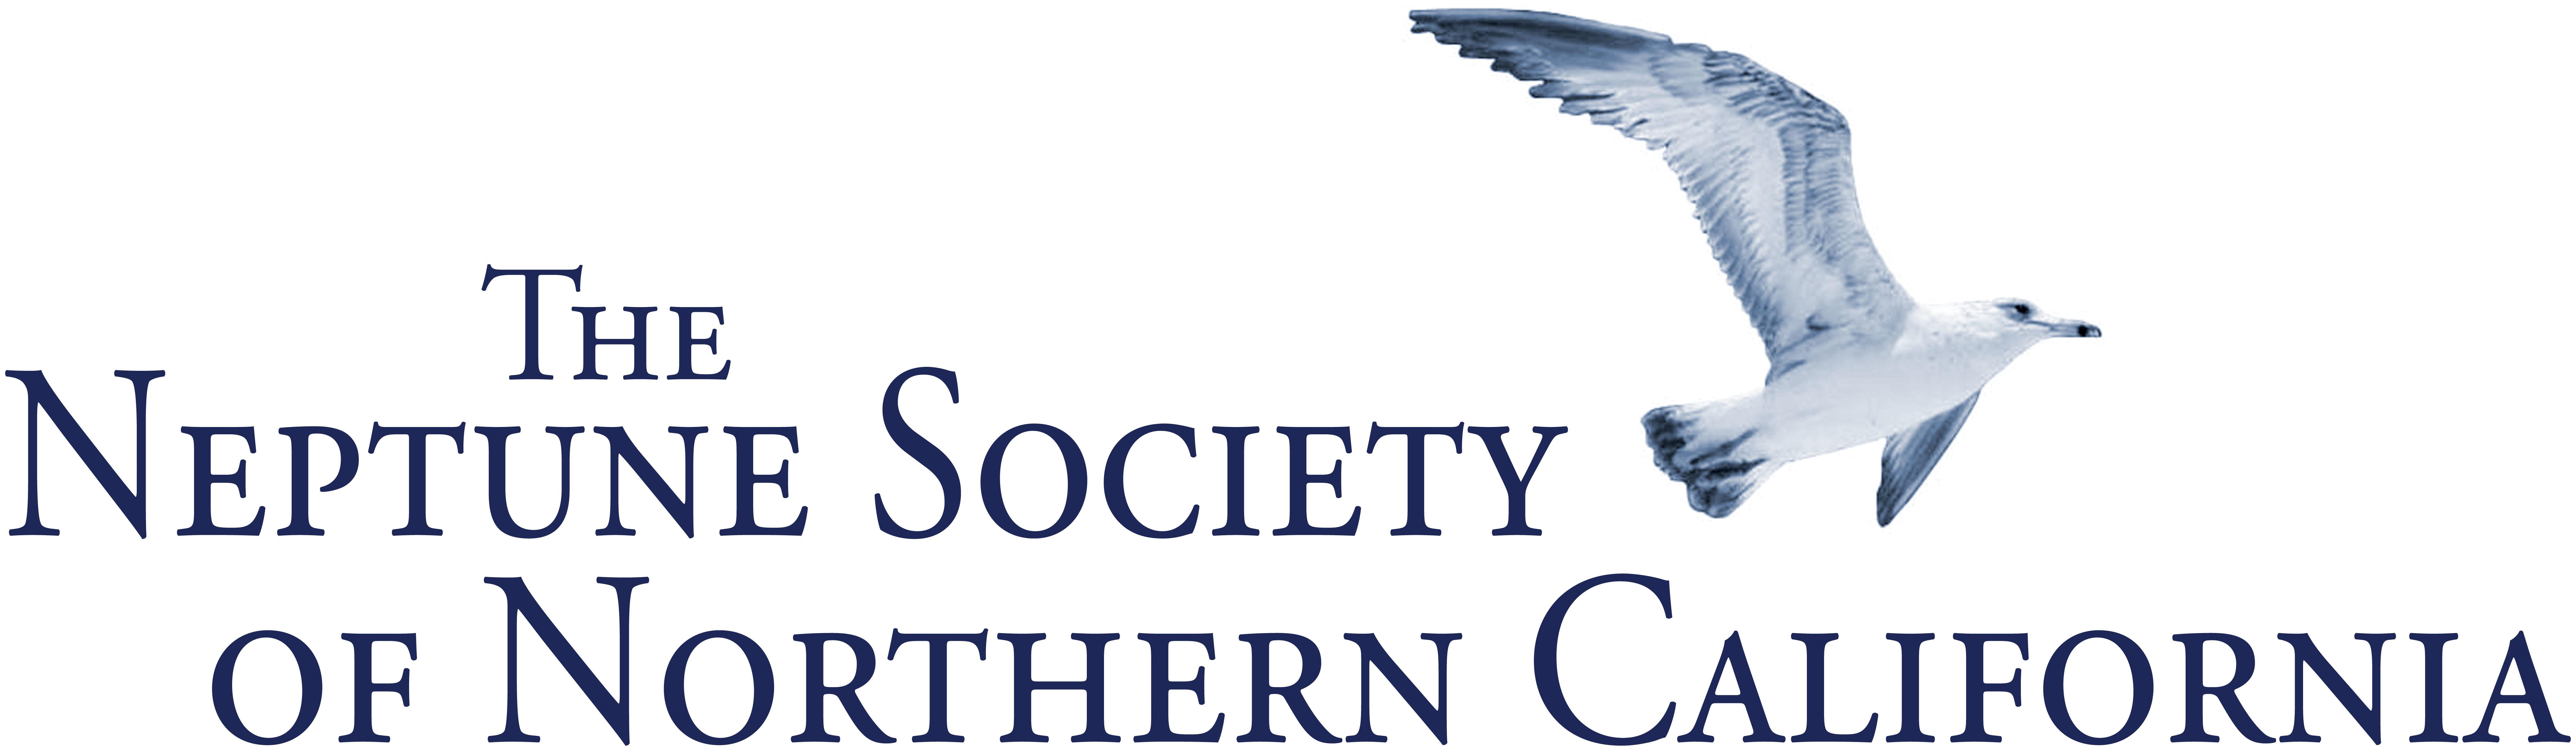 Neptune Society of Northern California